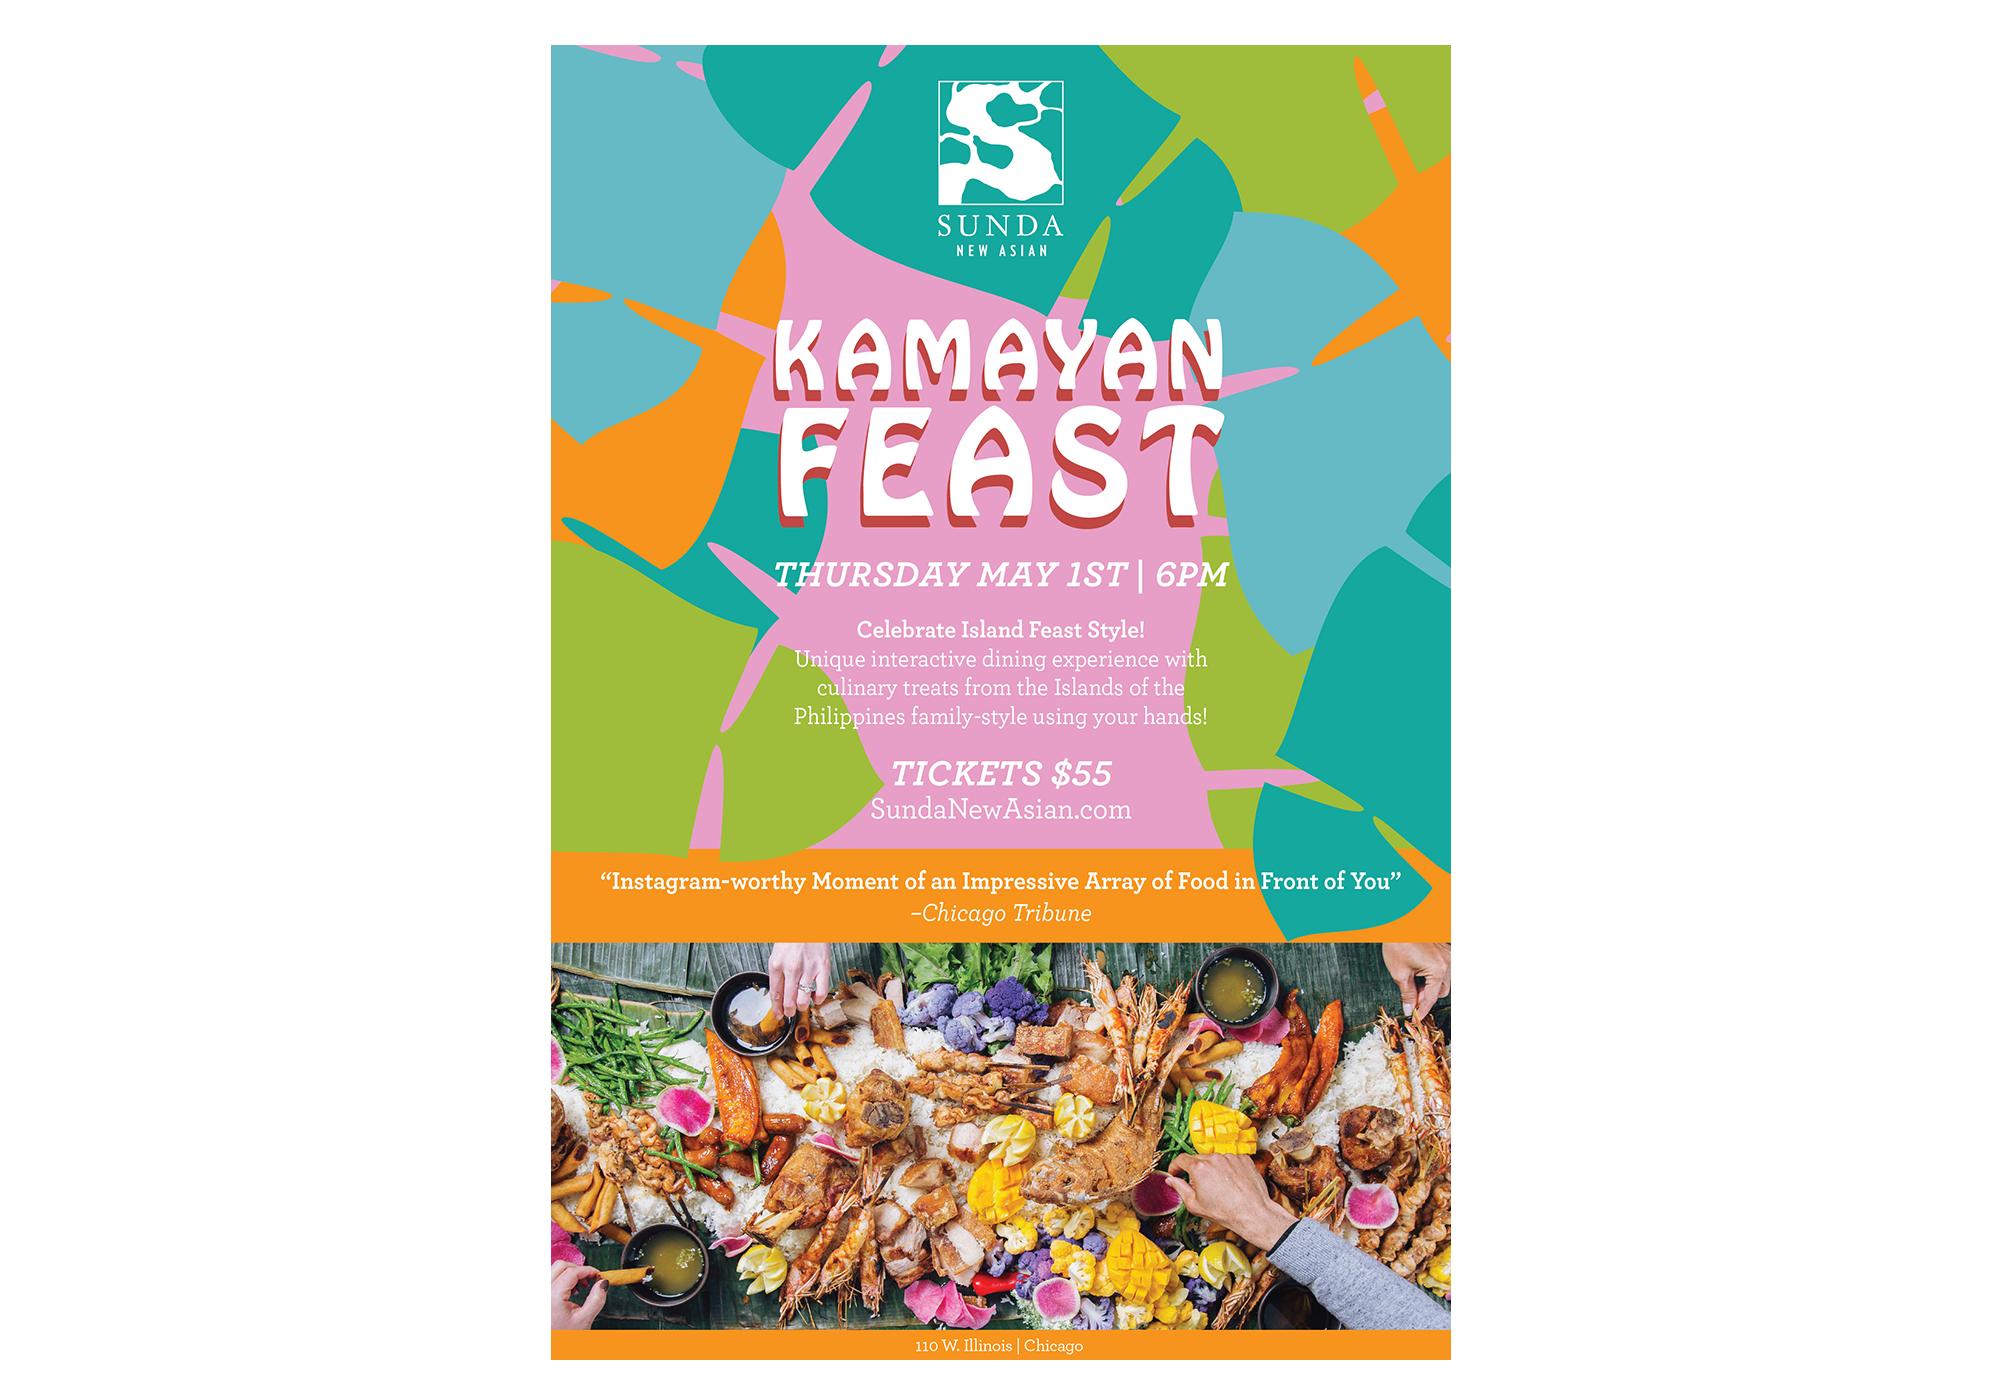 kamayan-feast-flyer.png